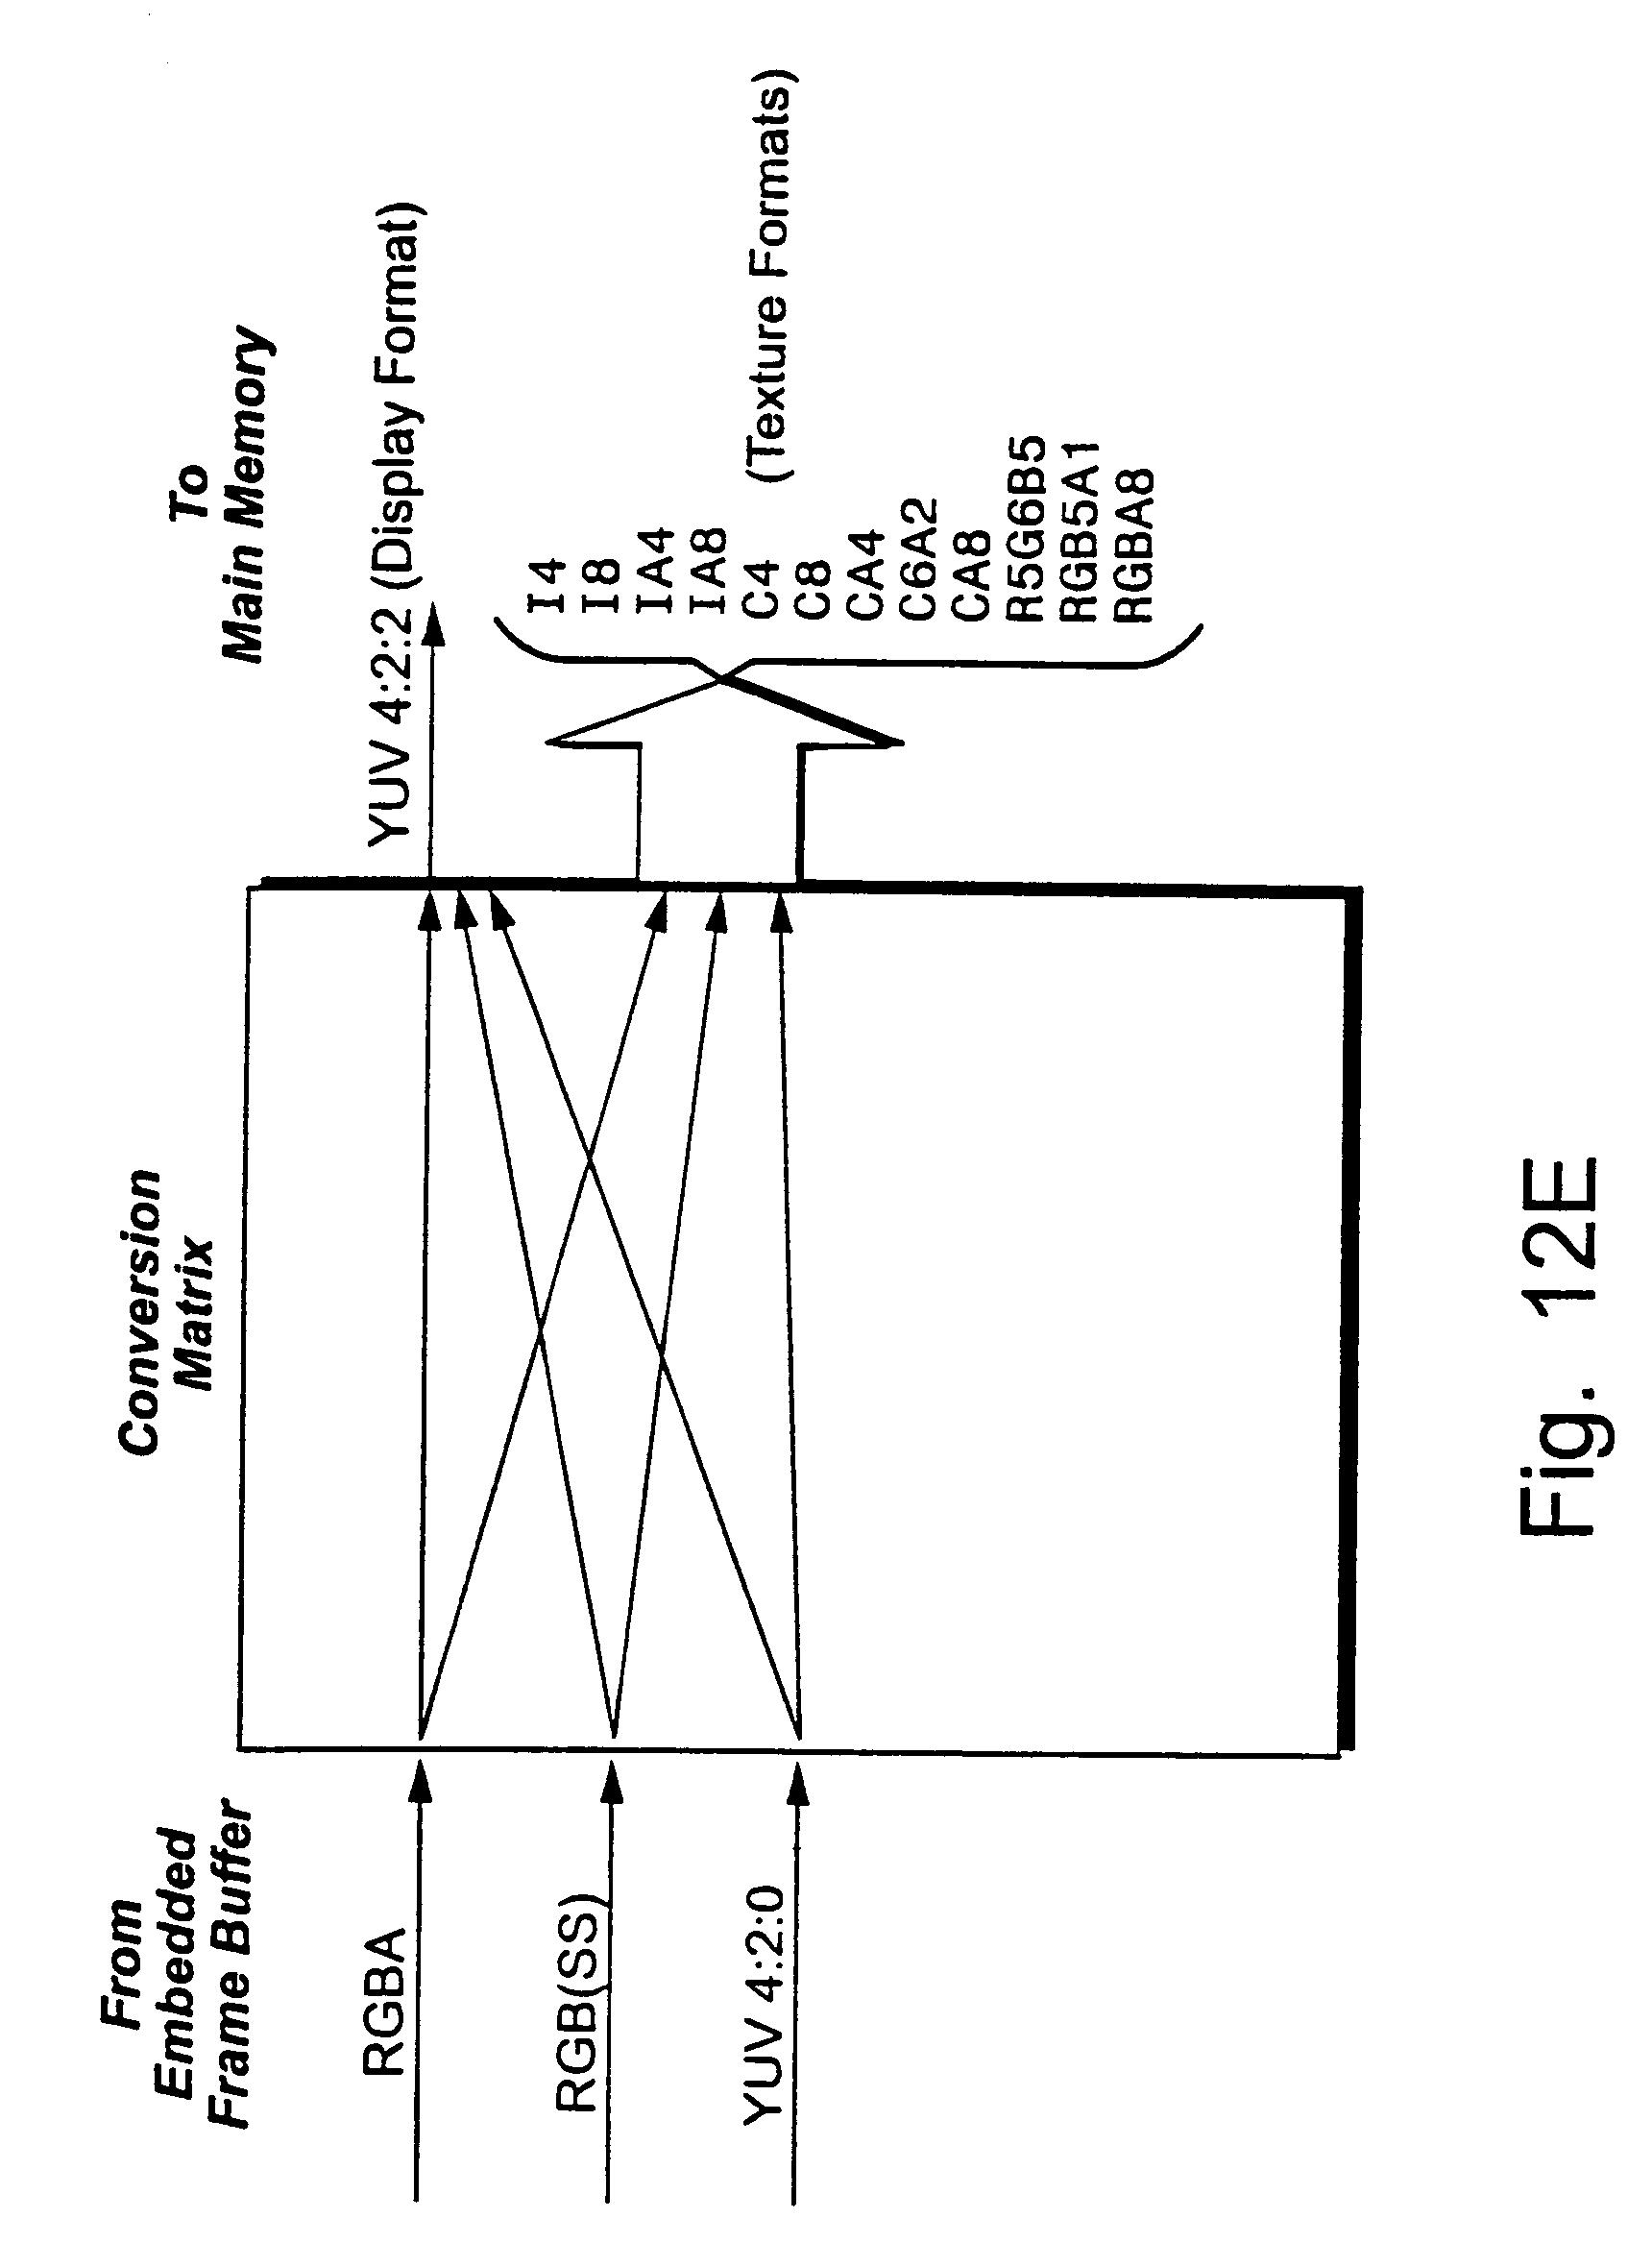 Patent US 7,184,059 B1